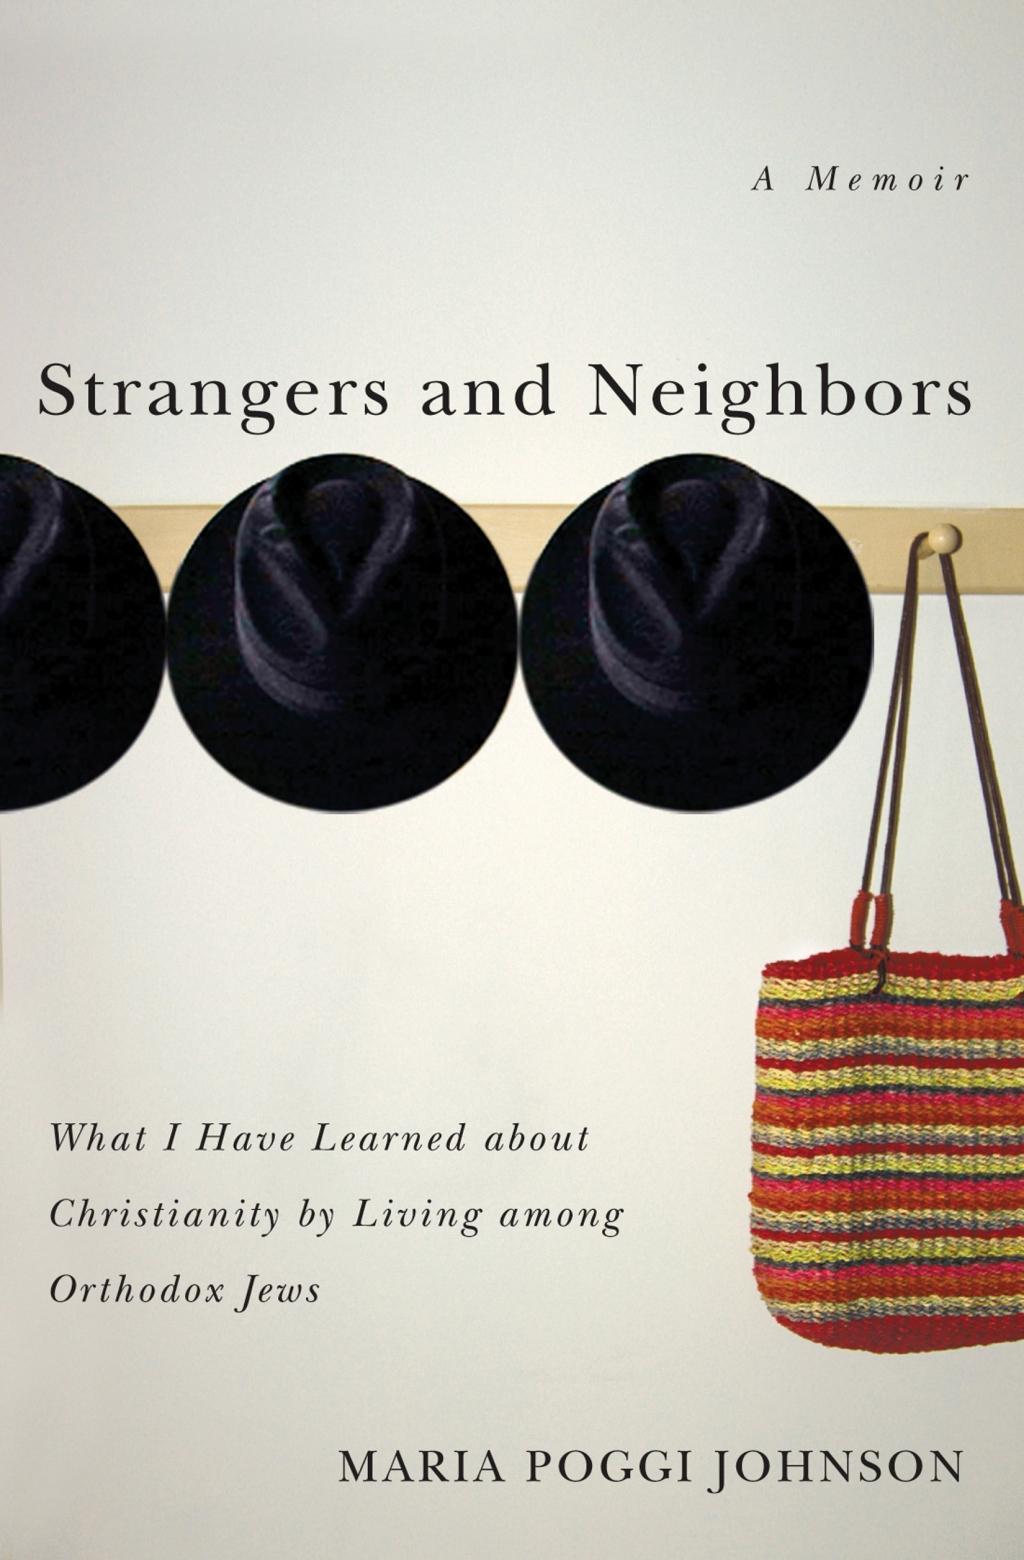 Strangers and Neighbors